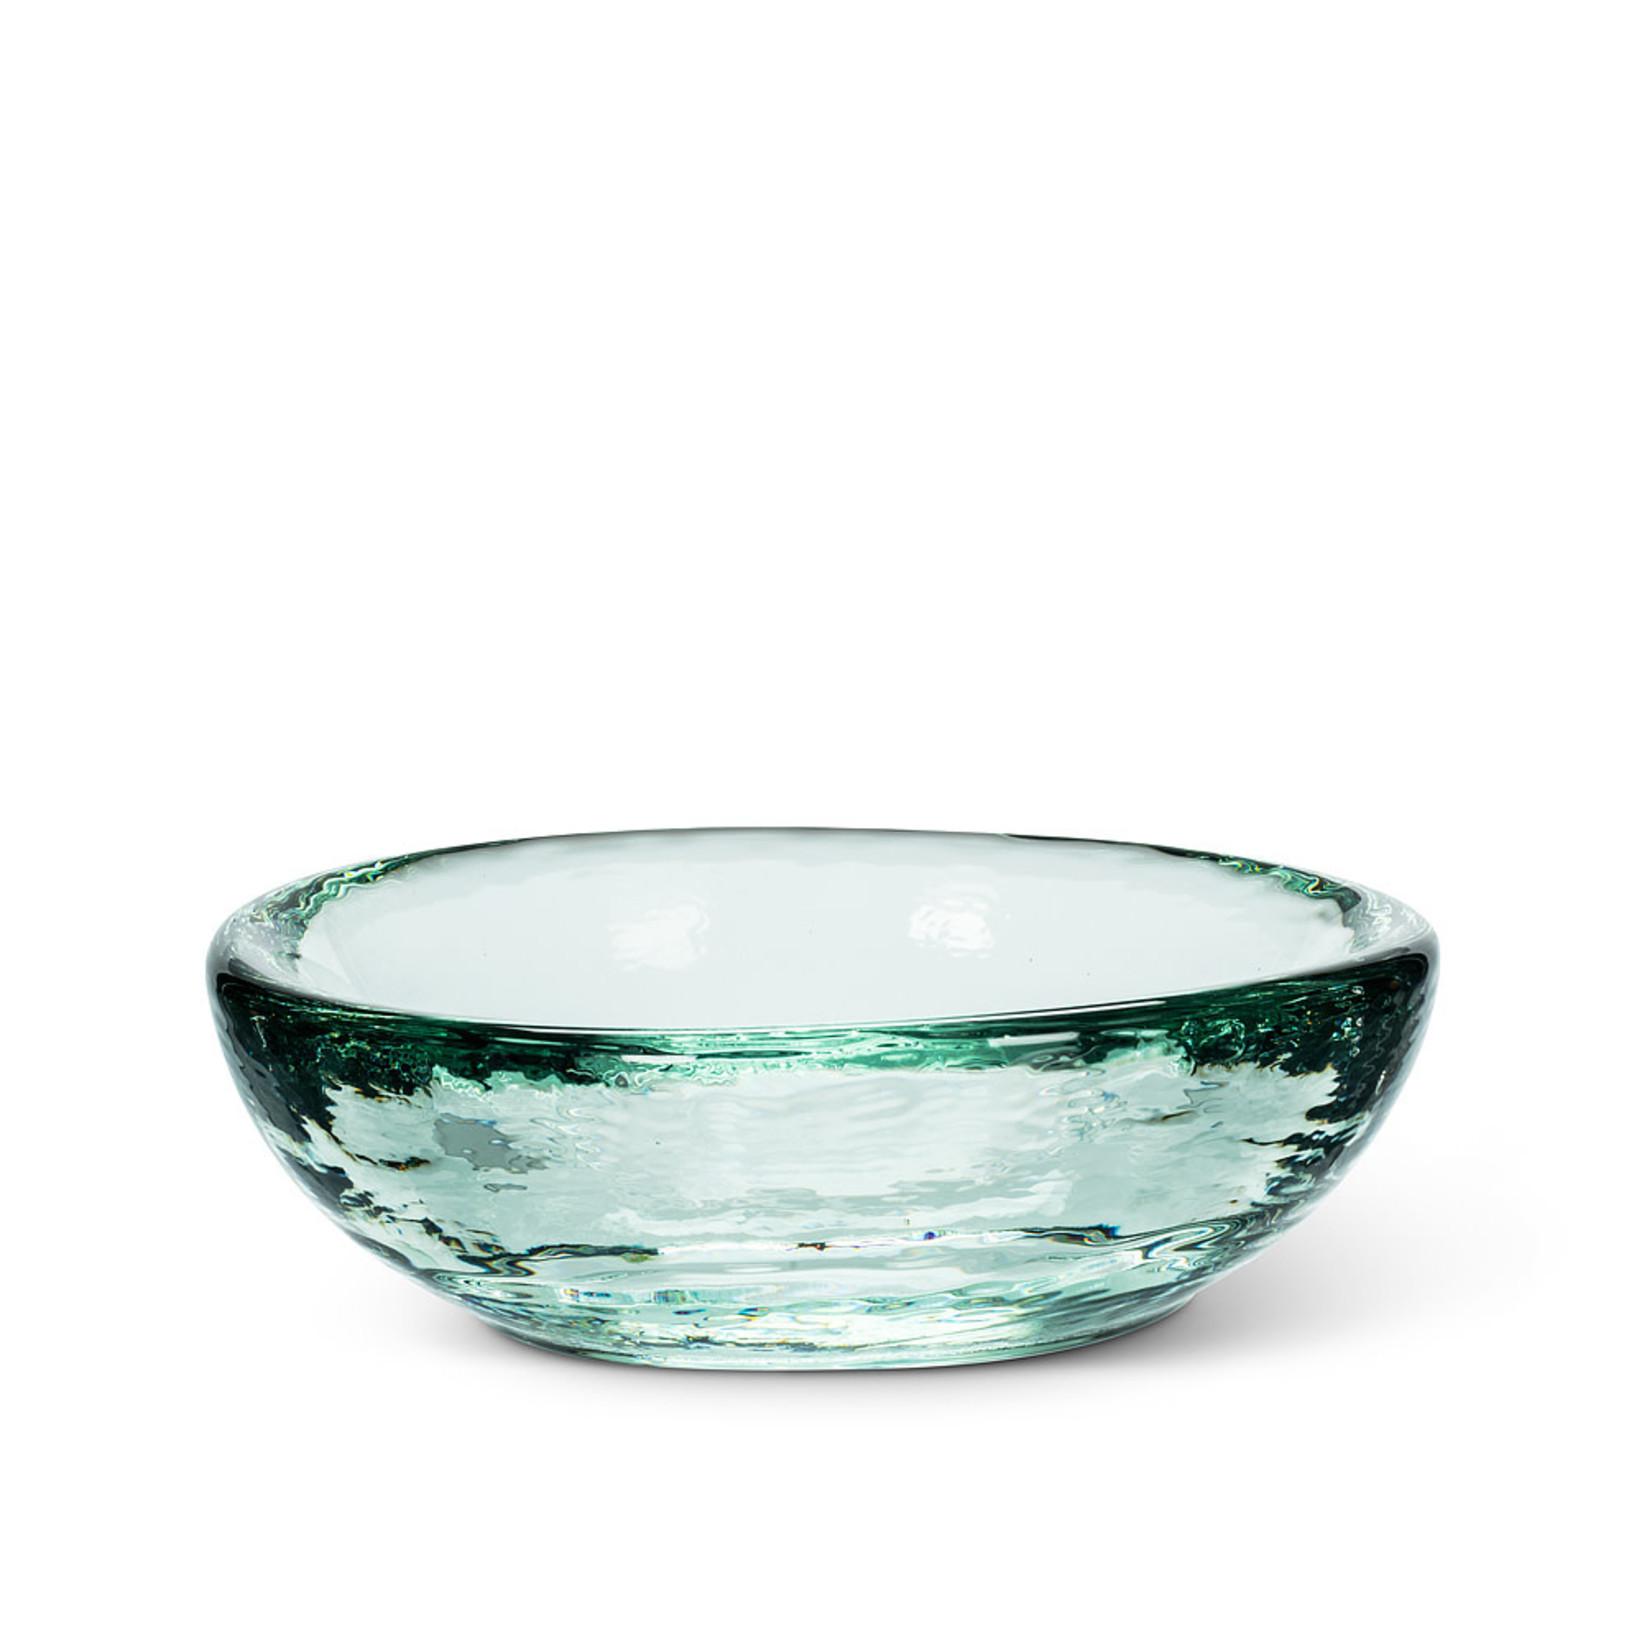 Small Shallow Dip/Pinch Dish